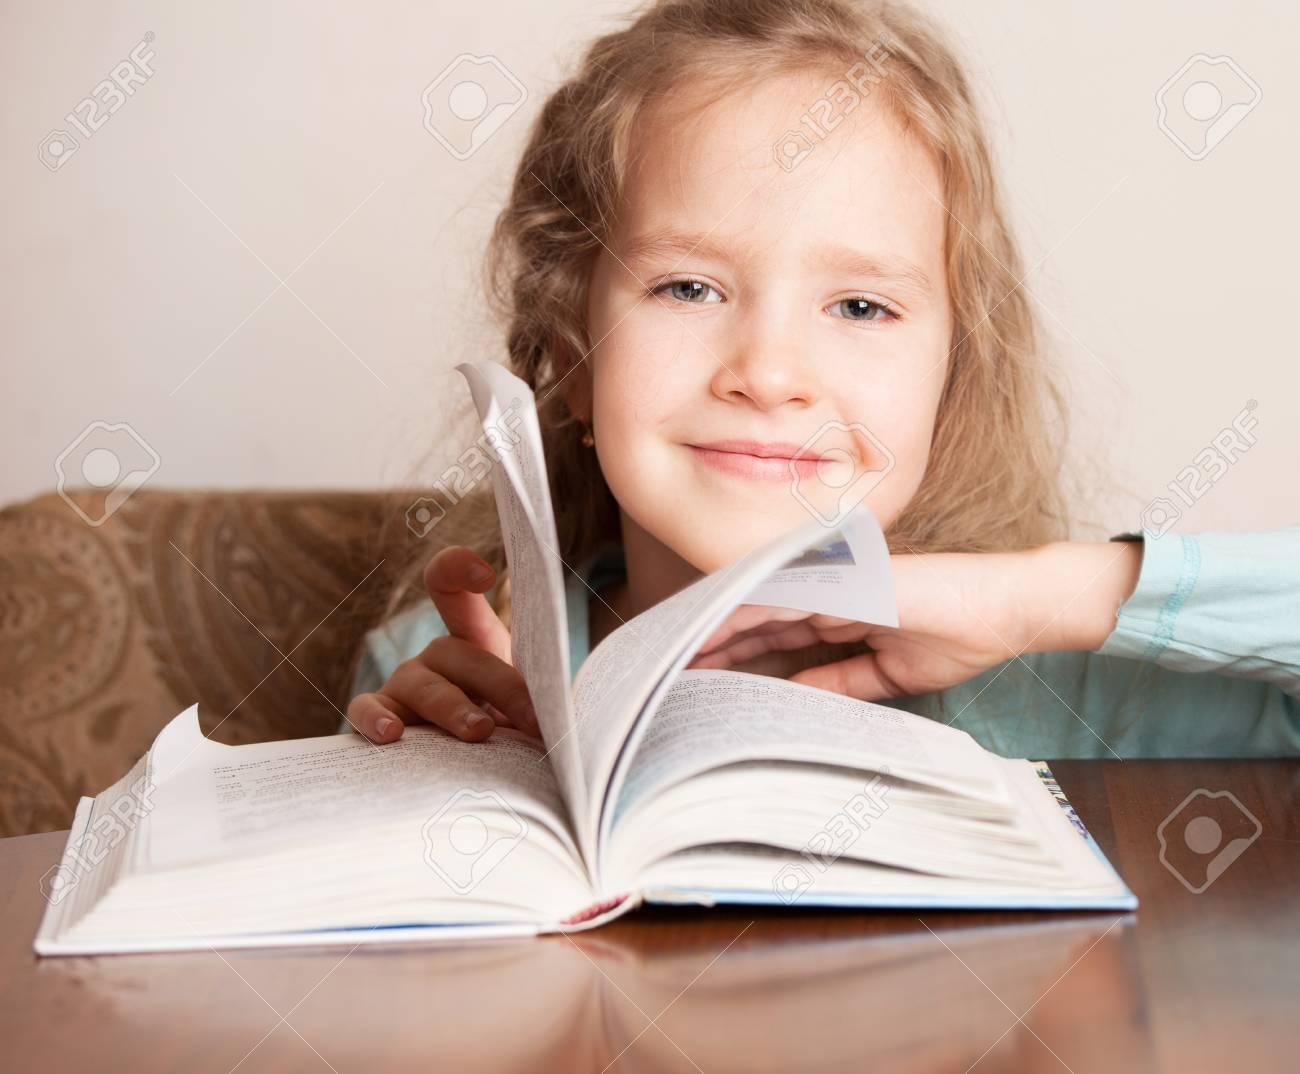 Education homework